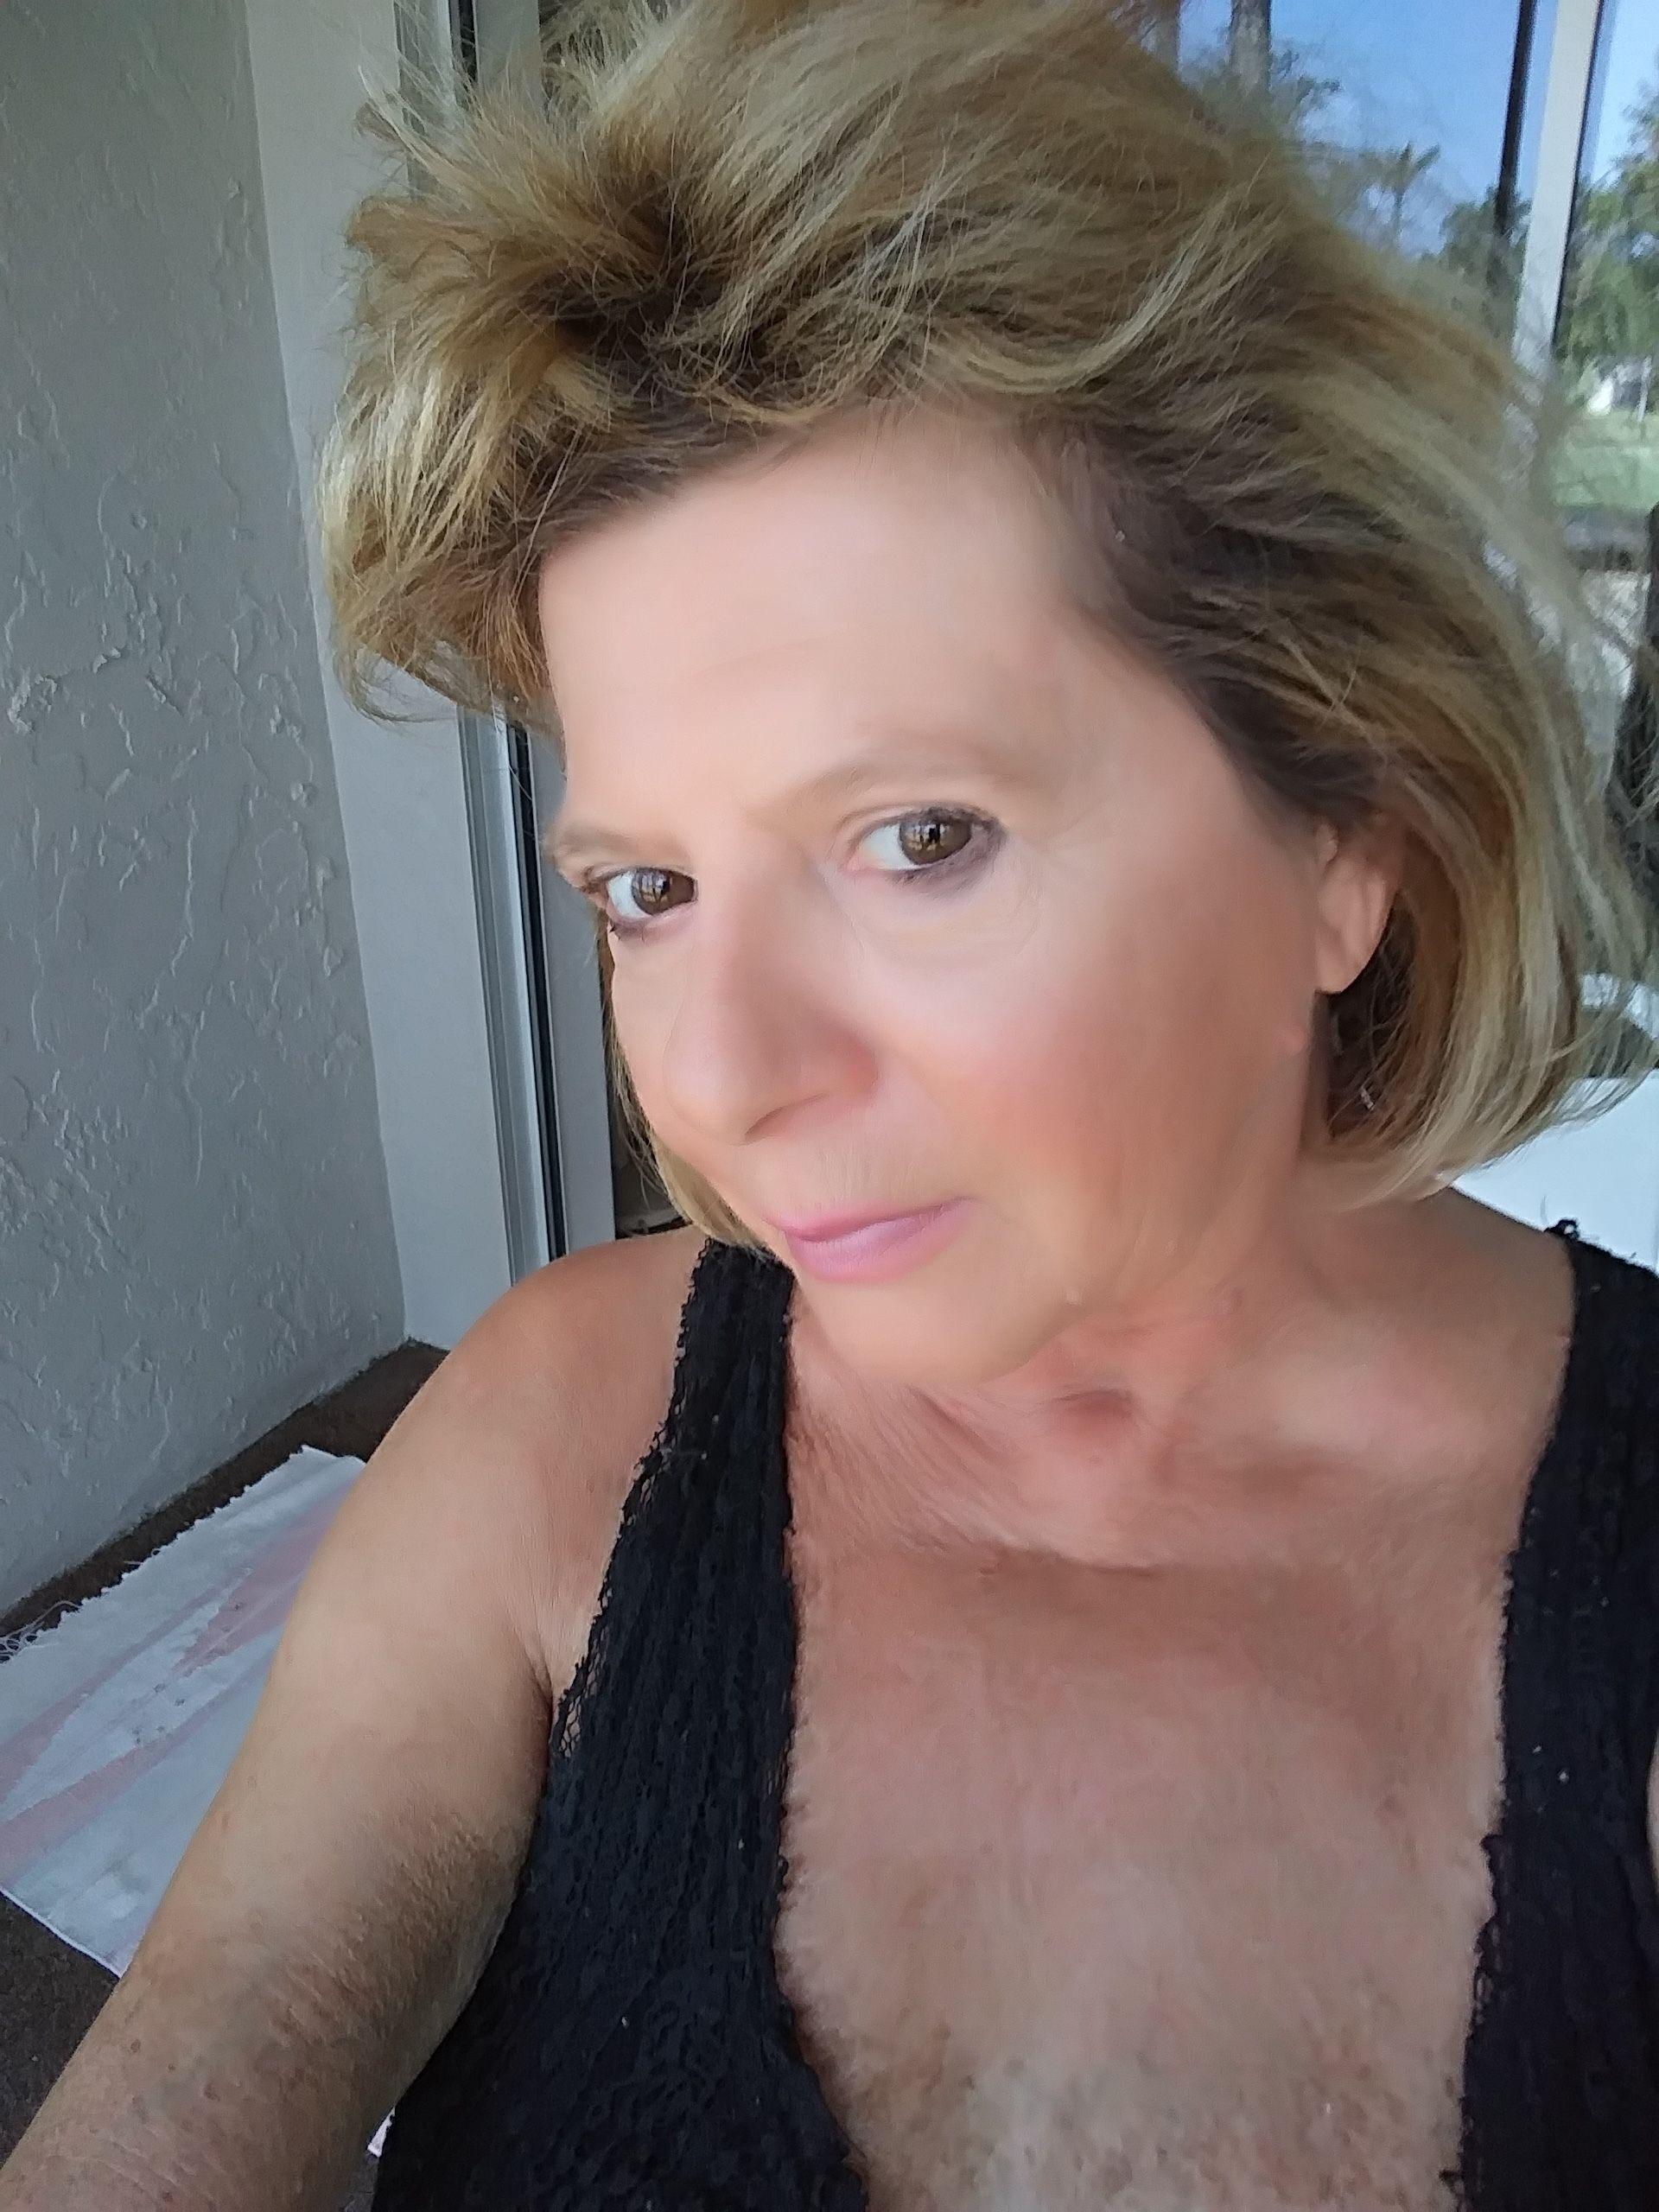 paras nainen dating site profiili